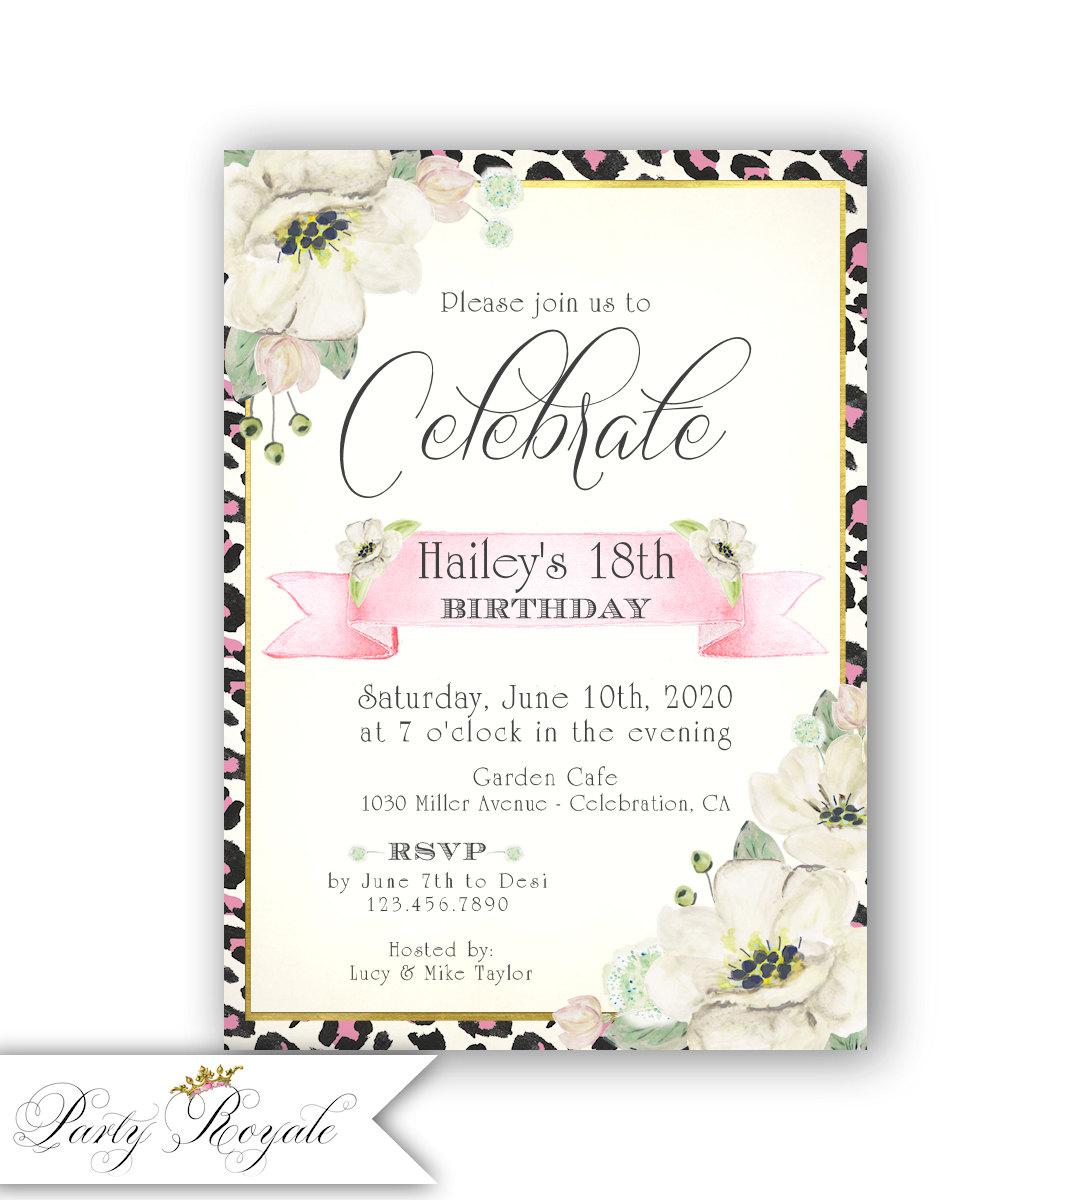 Leopard Print Birthday Invitations for Teen Girls 18th   Etsy